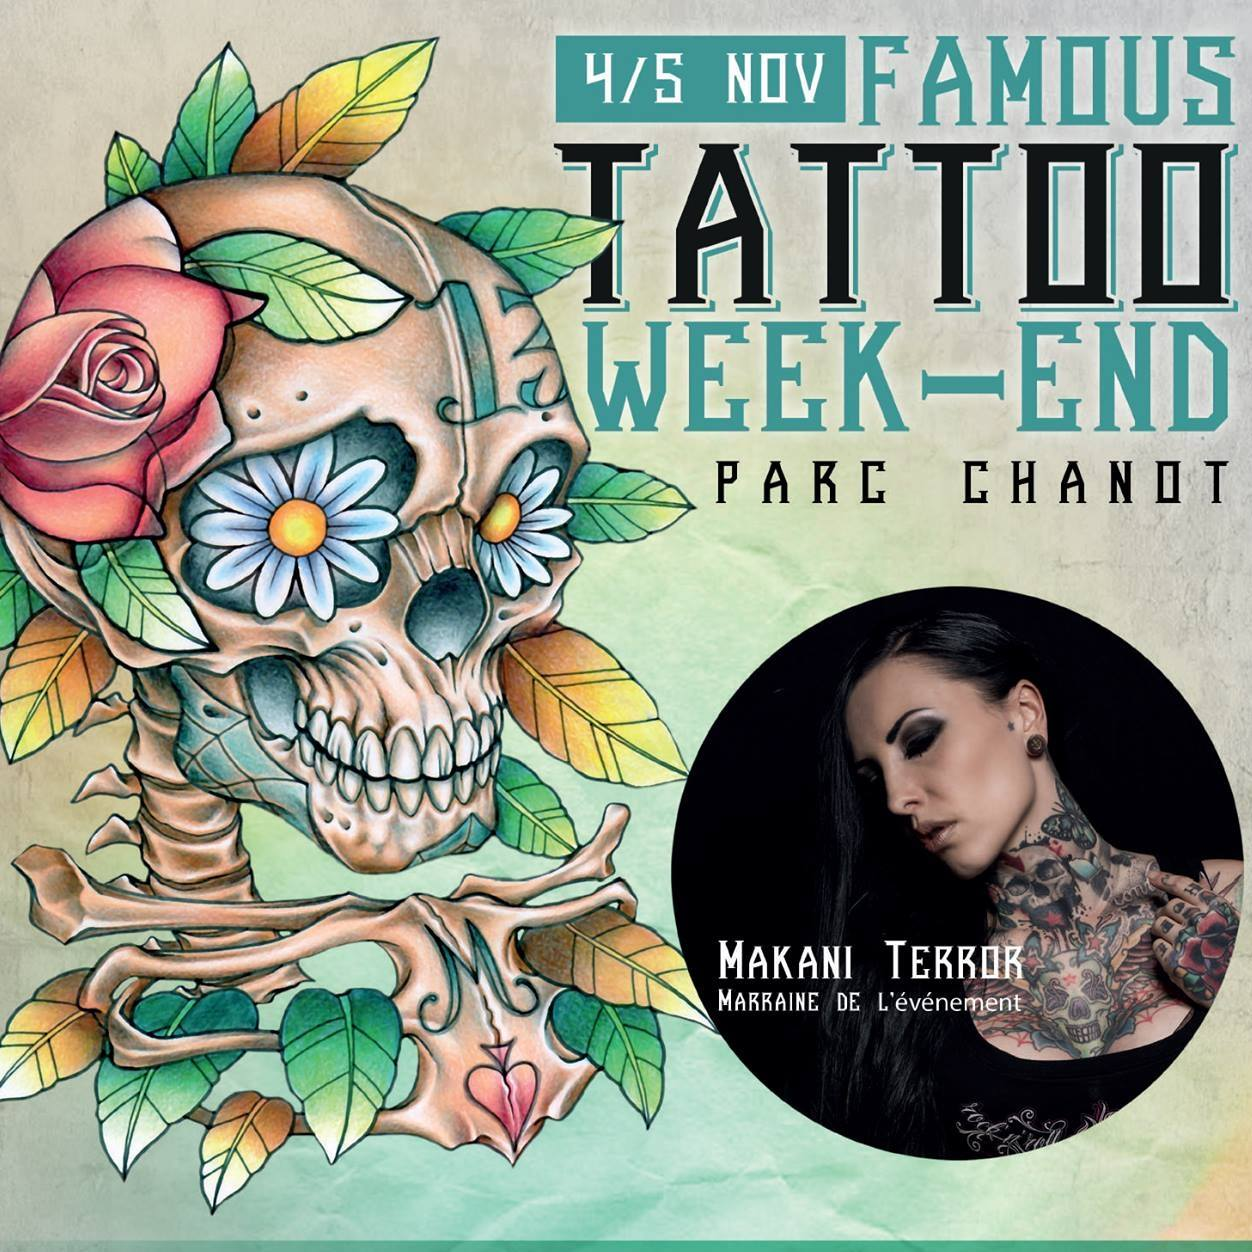 marseille paca bouche du rhone france tattoo convention indy artwork artiste tatoueur tattoosit ink inker convention festival tattoo show art body france paris